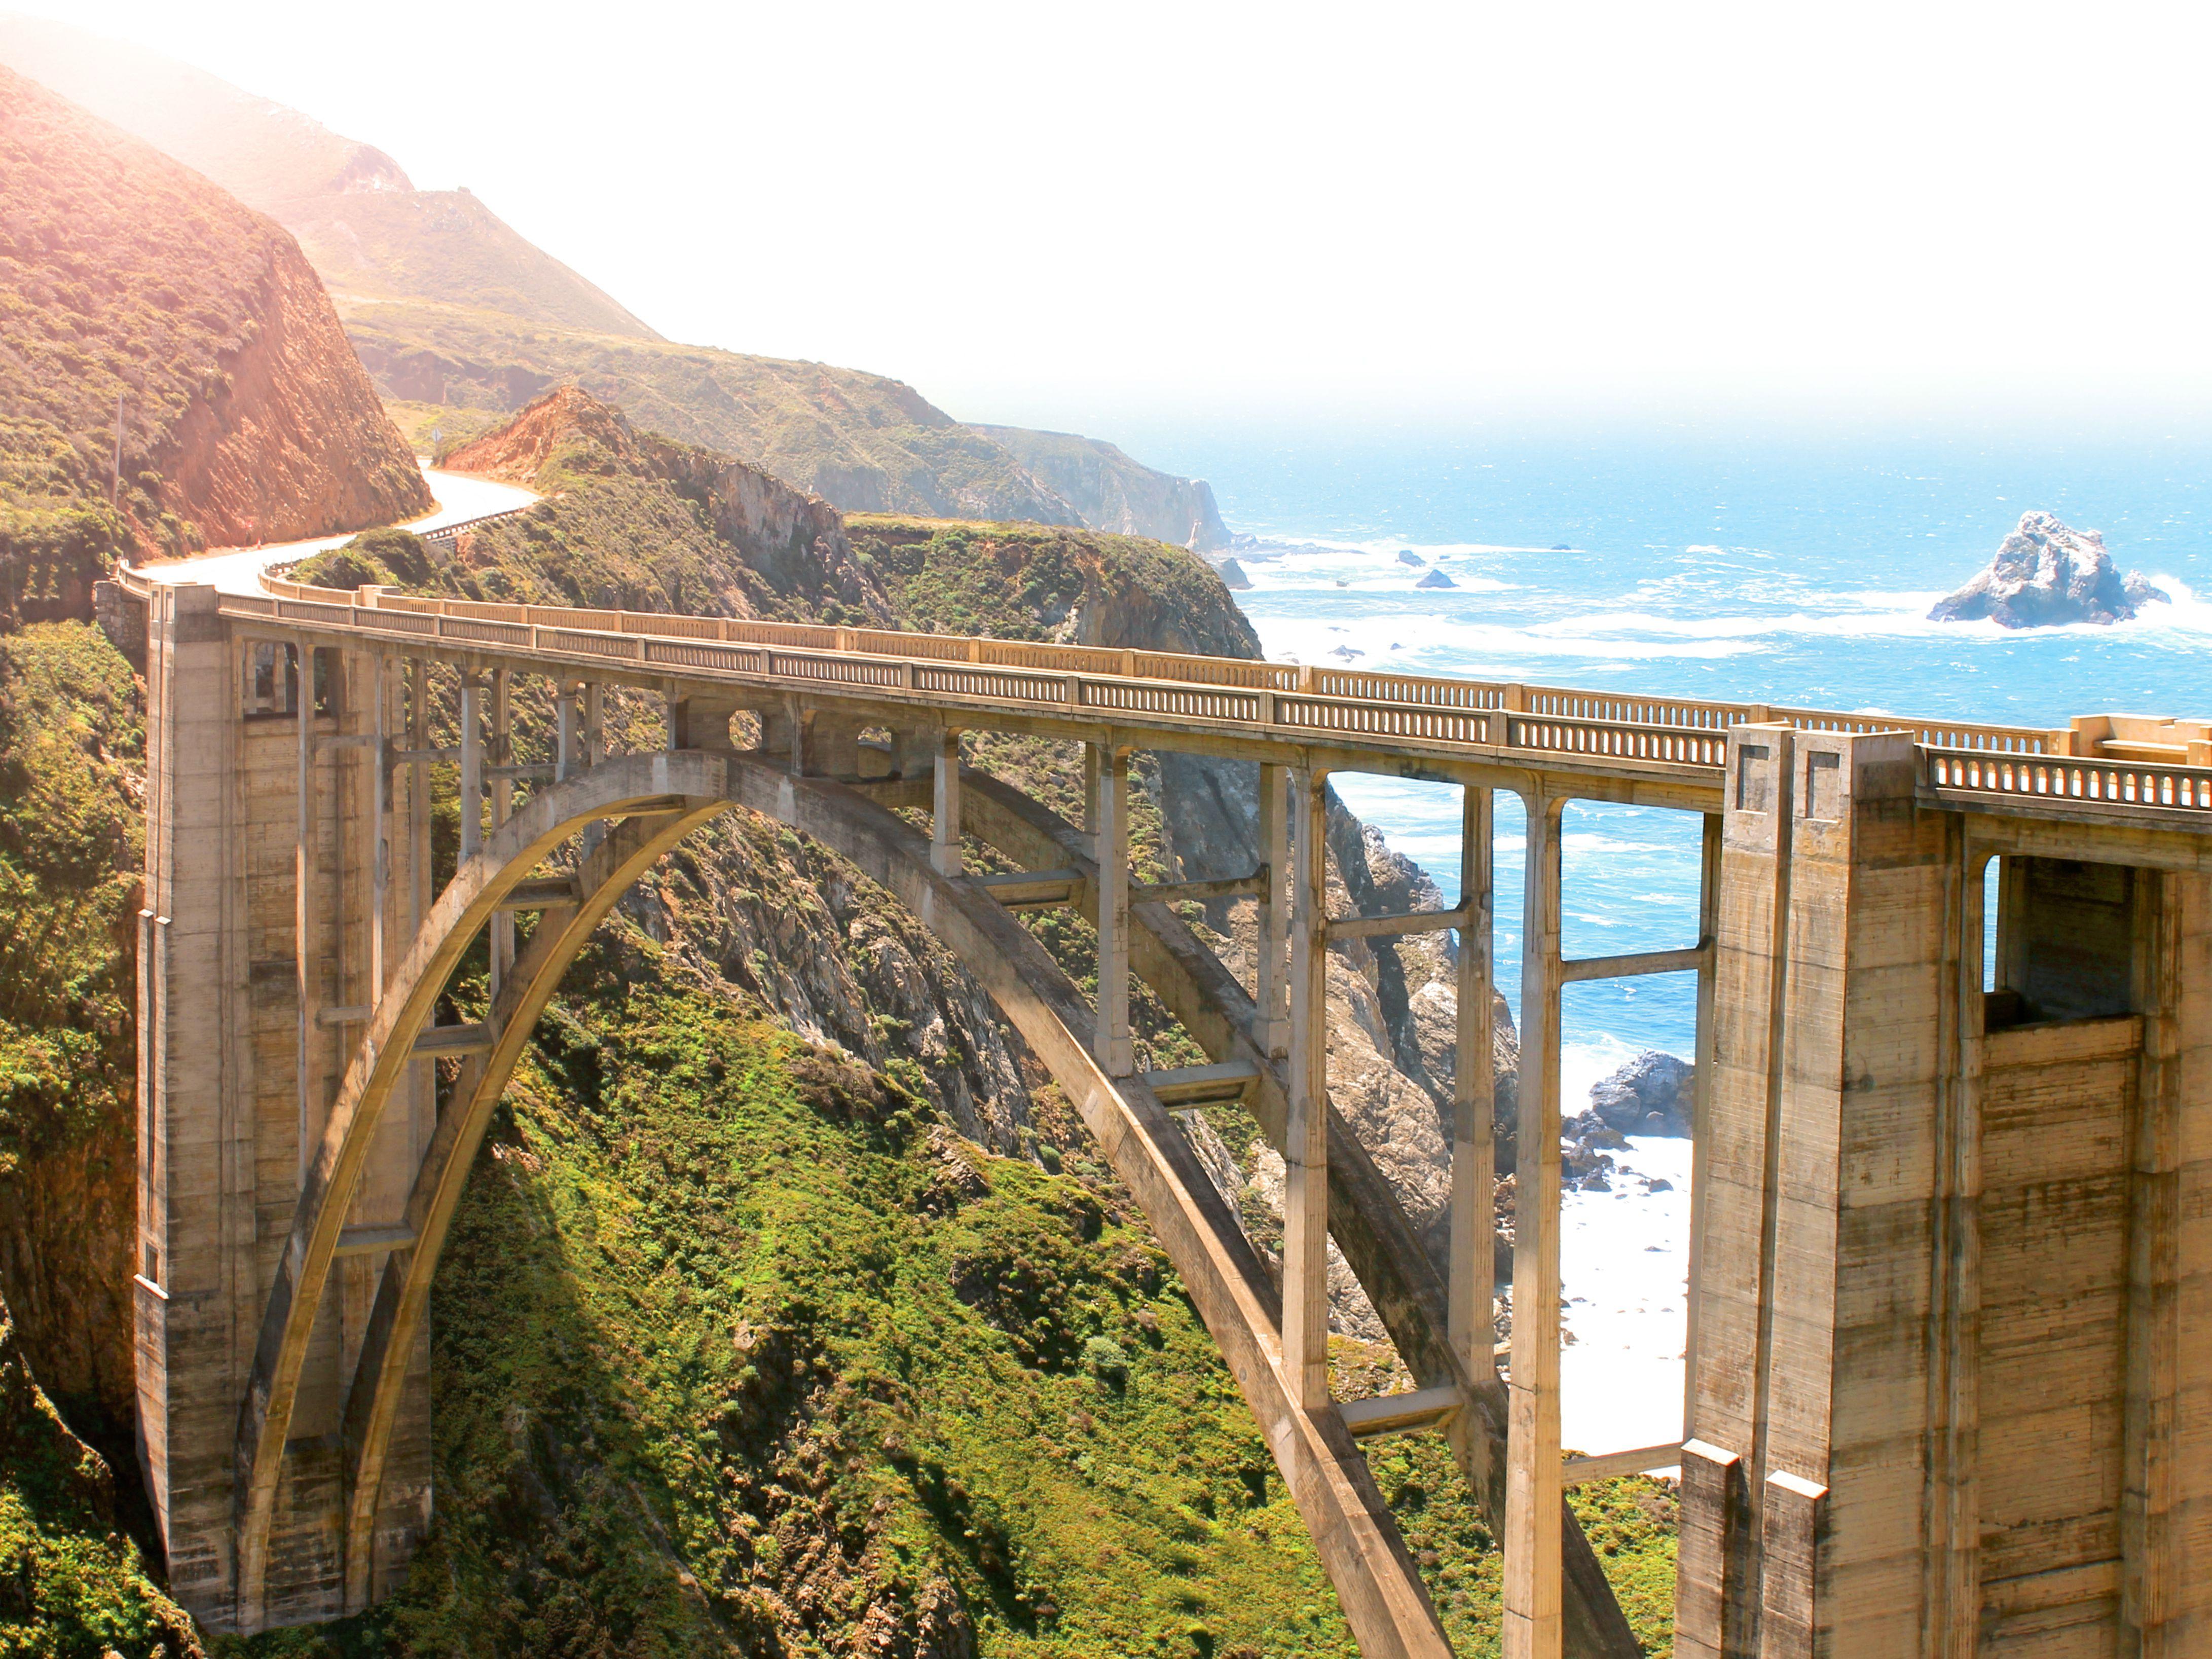 Weekend Getaways in California 12 Trips You Can Take